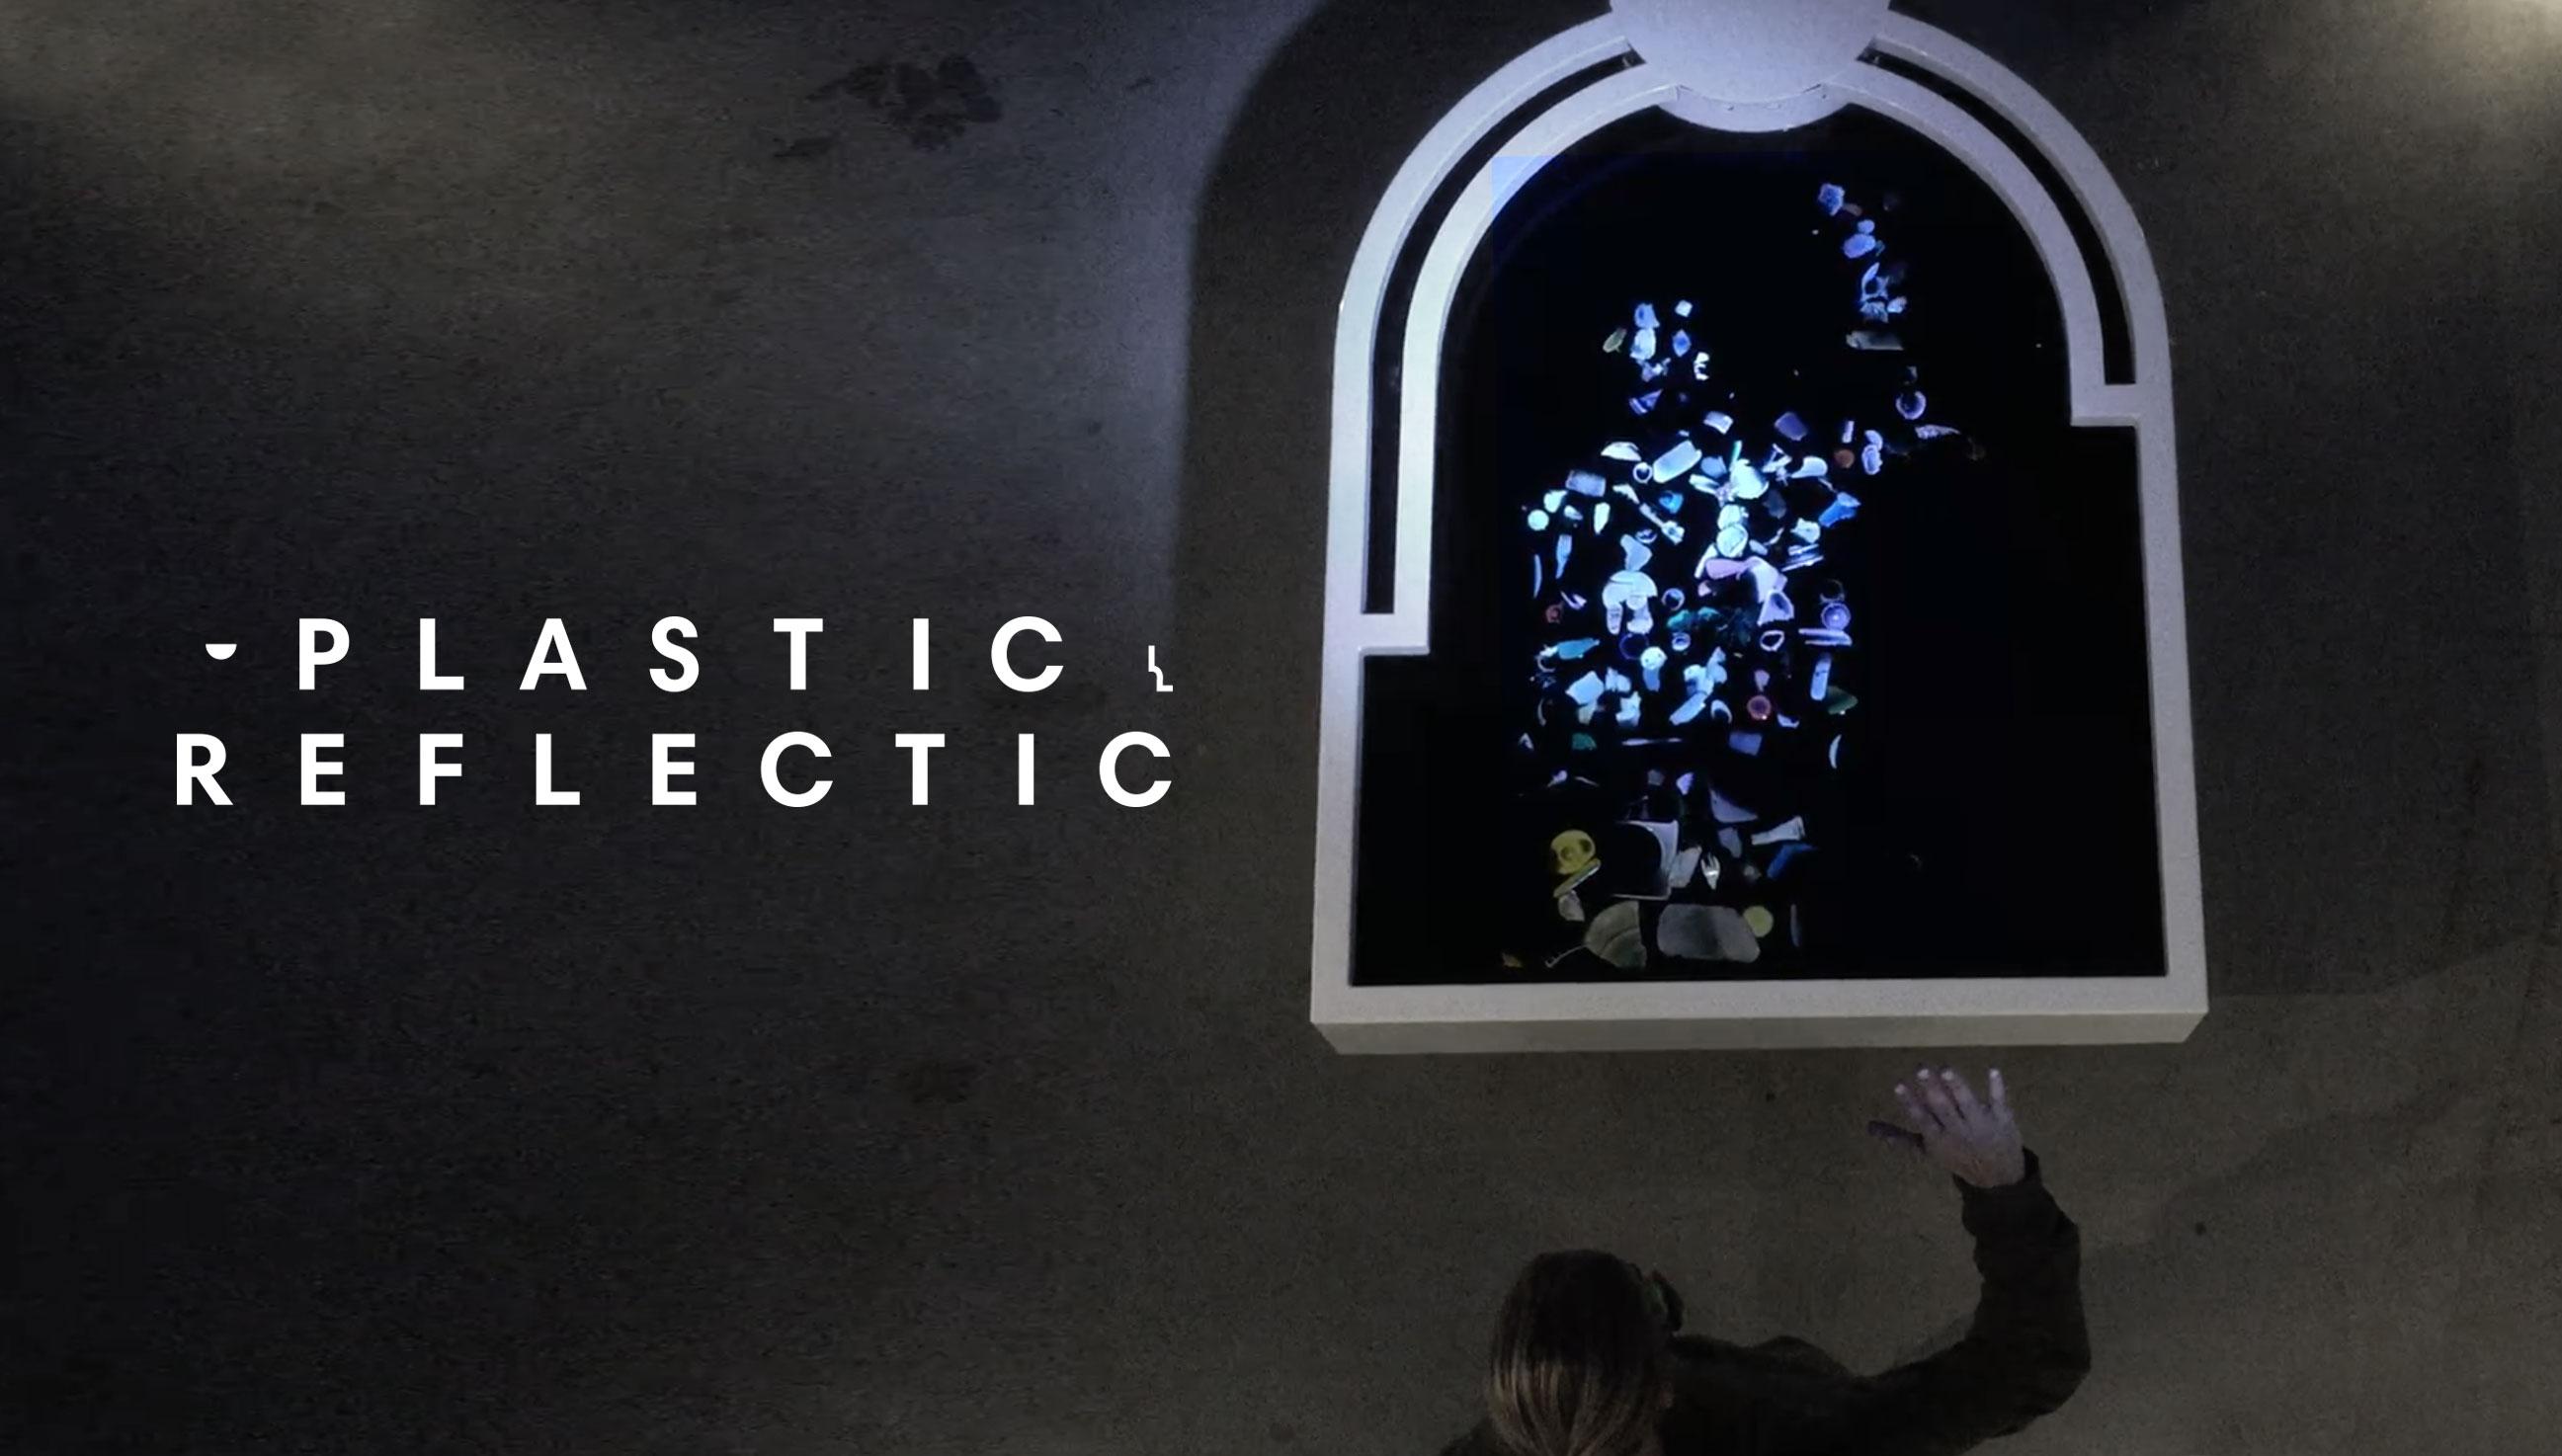 plasticreflectic2016-thijsbiersteker